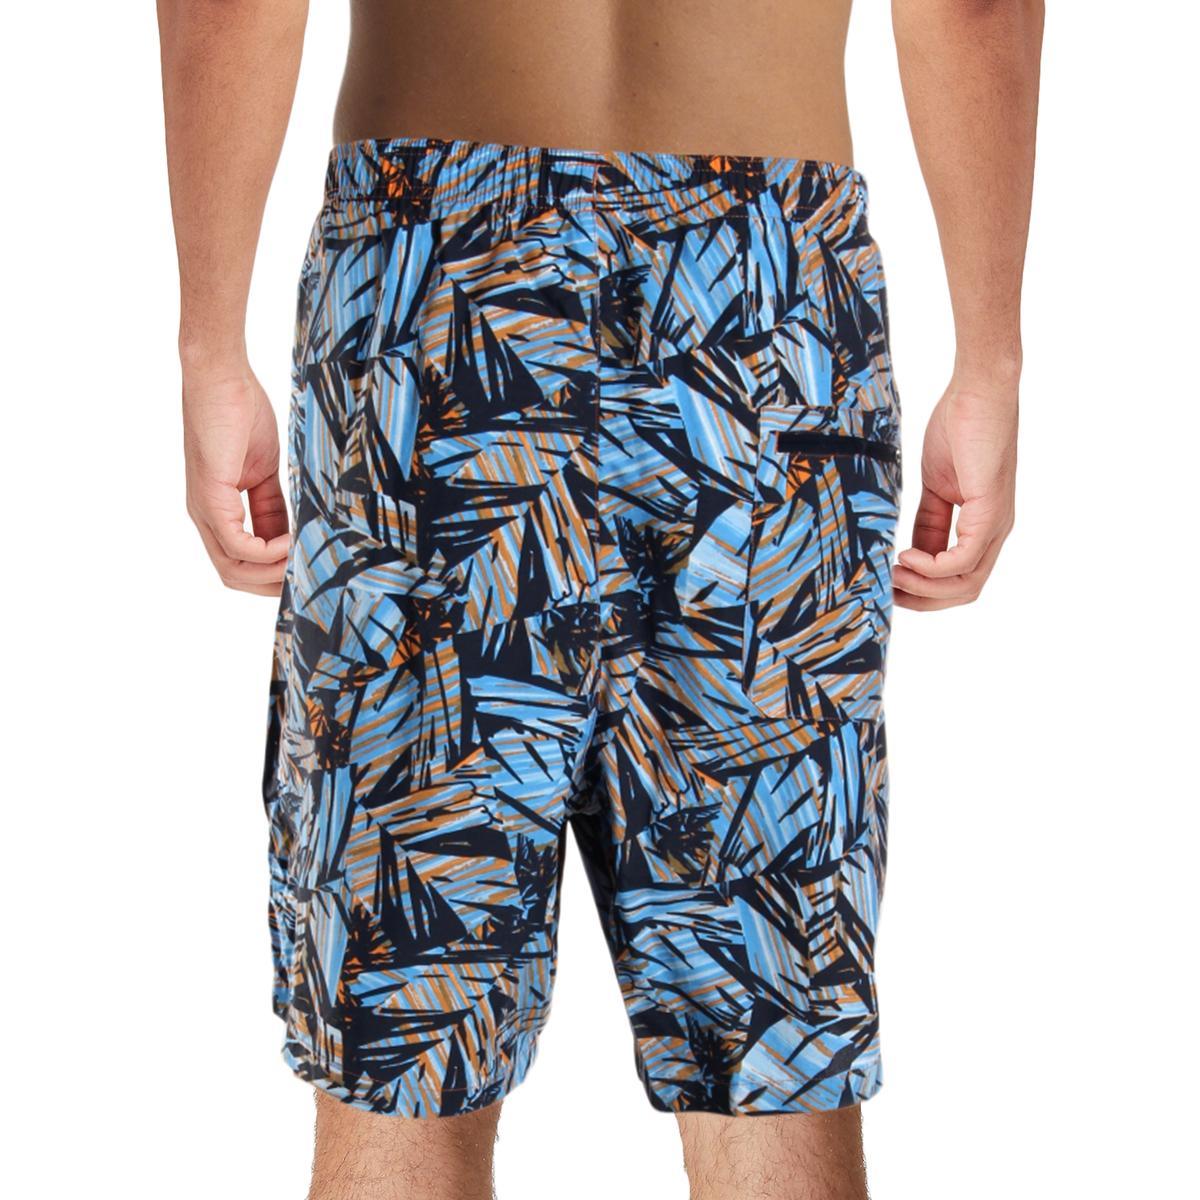 Columbia-Mens-Big-Dippers-Printed-Swim-Trunks-Swimsuit-Big-amp-Tall-BHFO-5580 thumbnail 6